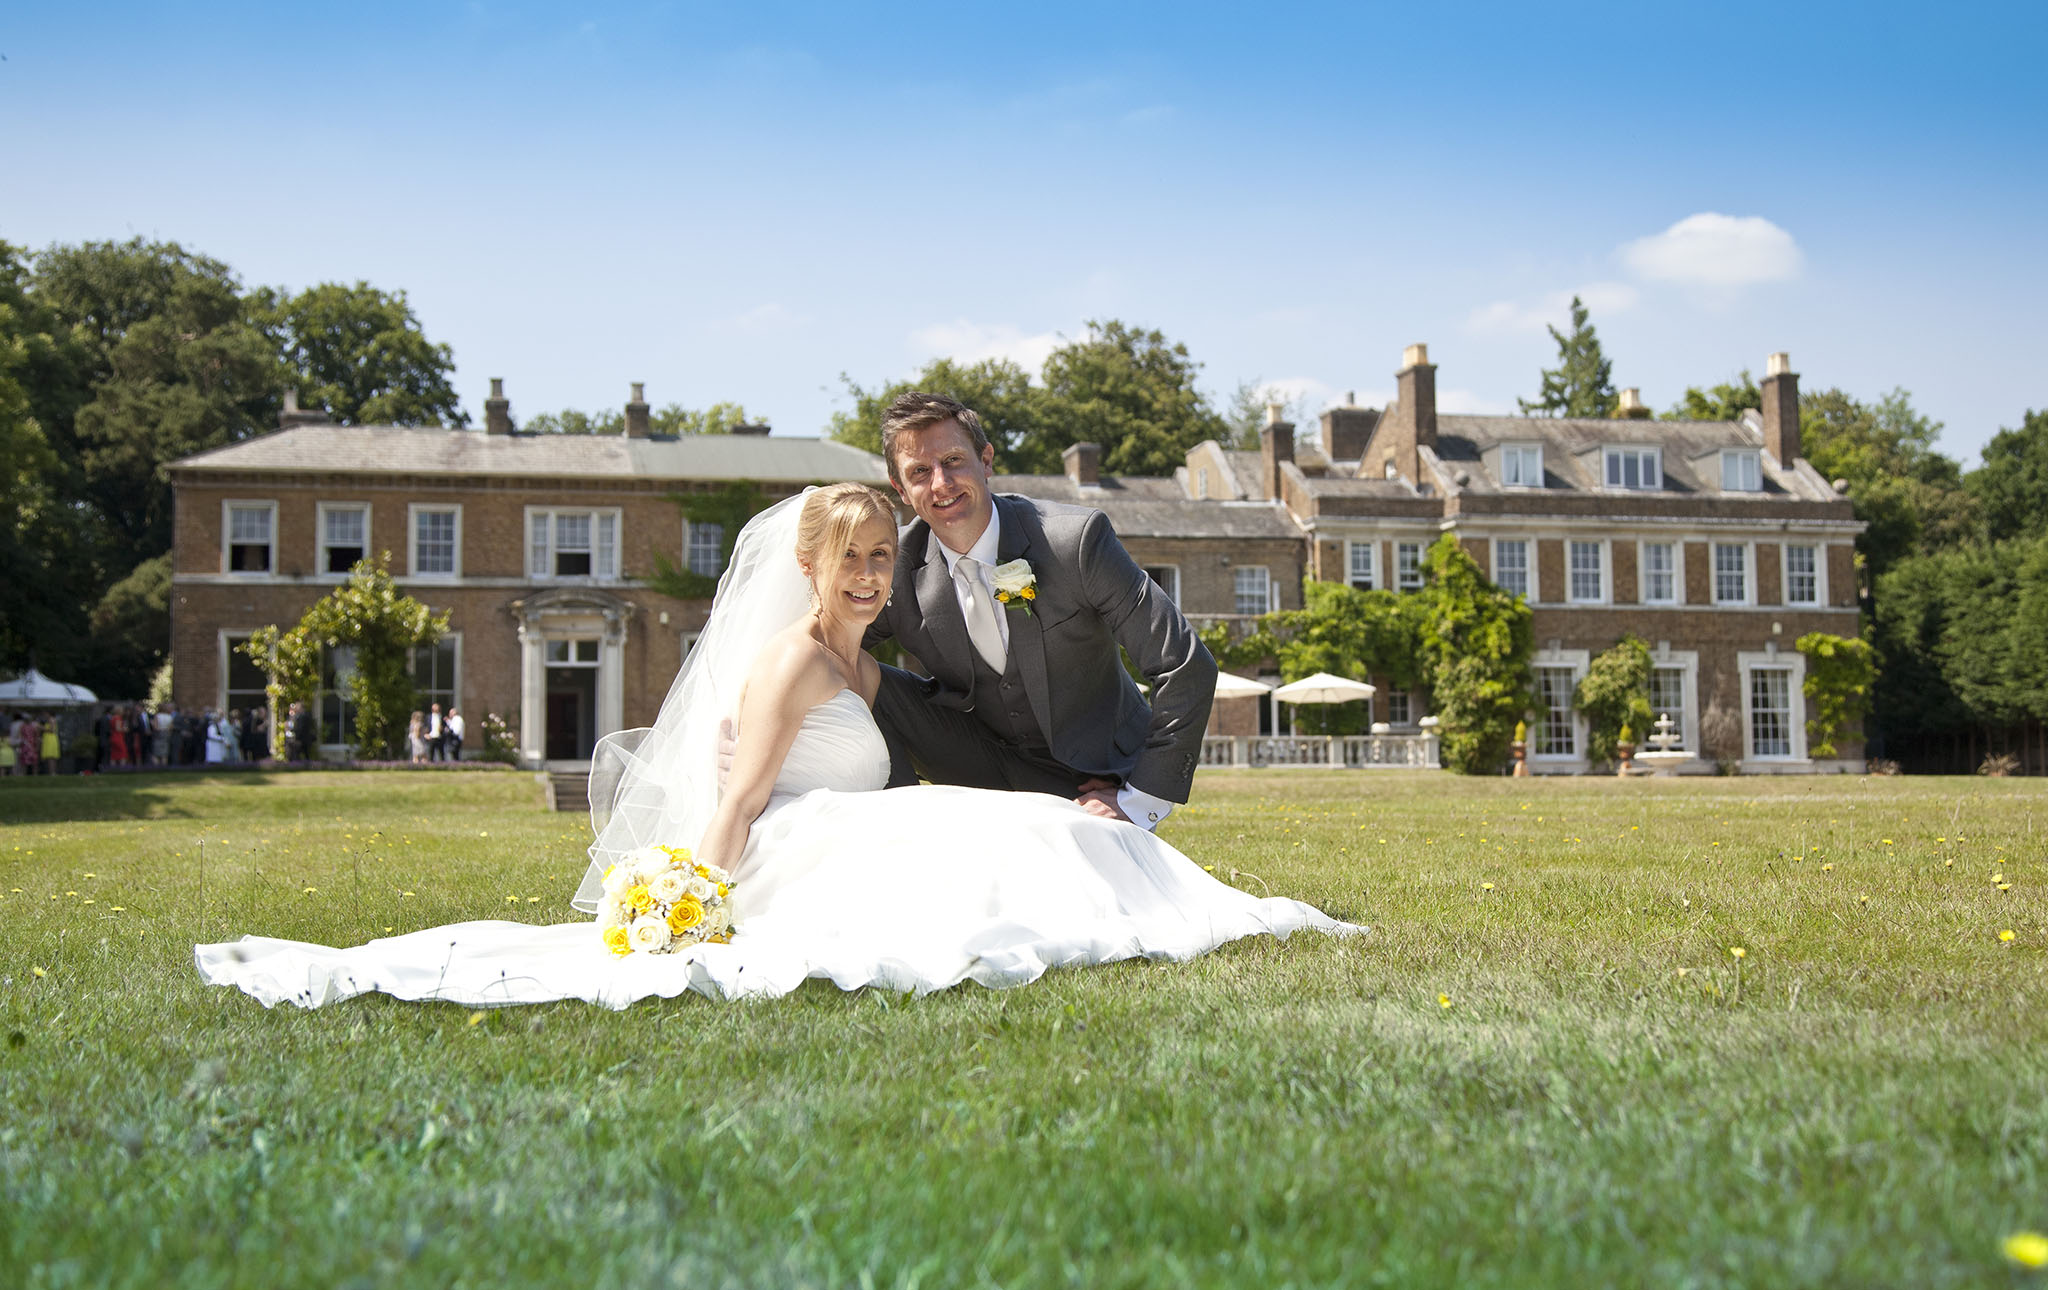 elizabethg_fineart_photography_hertfordshire_rachel_adam_wedding_highelmsmanor_33.jpg